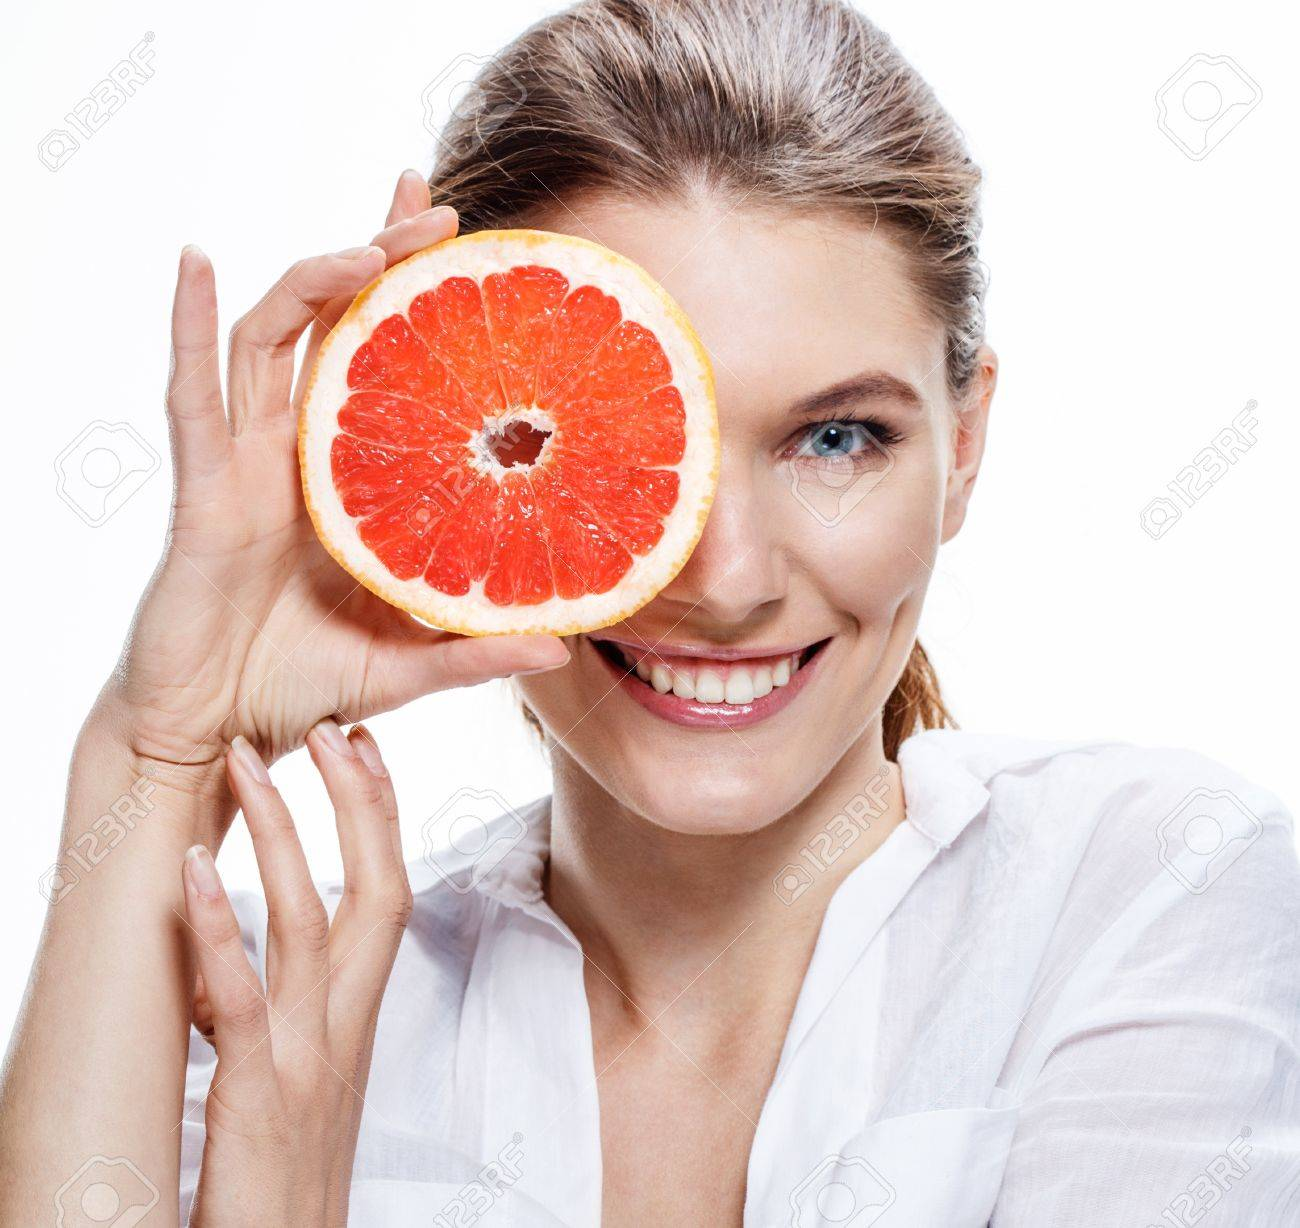 smiling brunette european woman with mottled orange slice - isolated on white background Stock Photo - 21217254